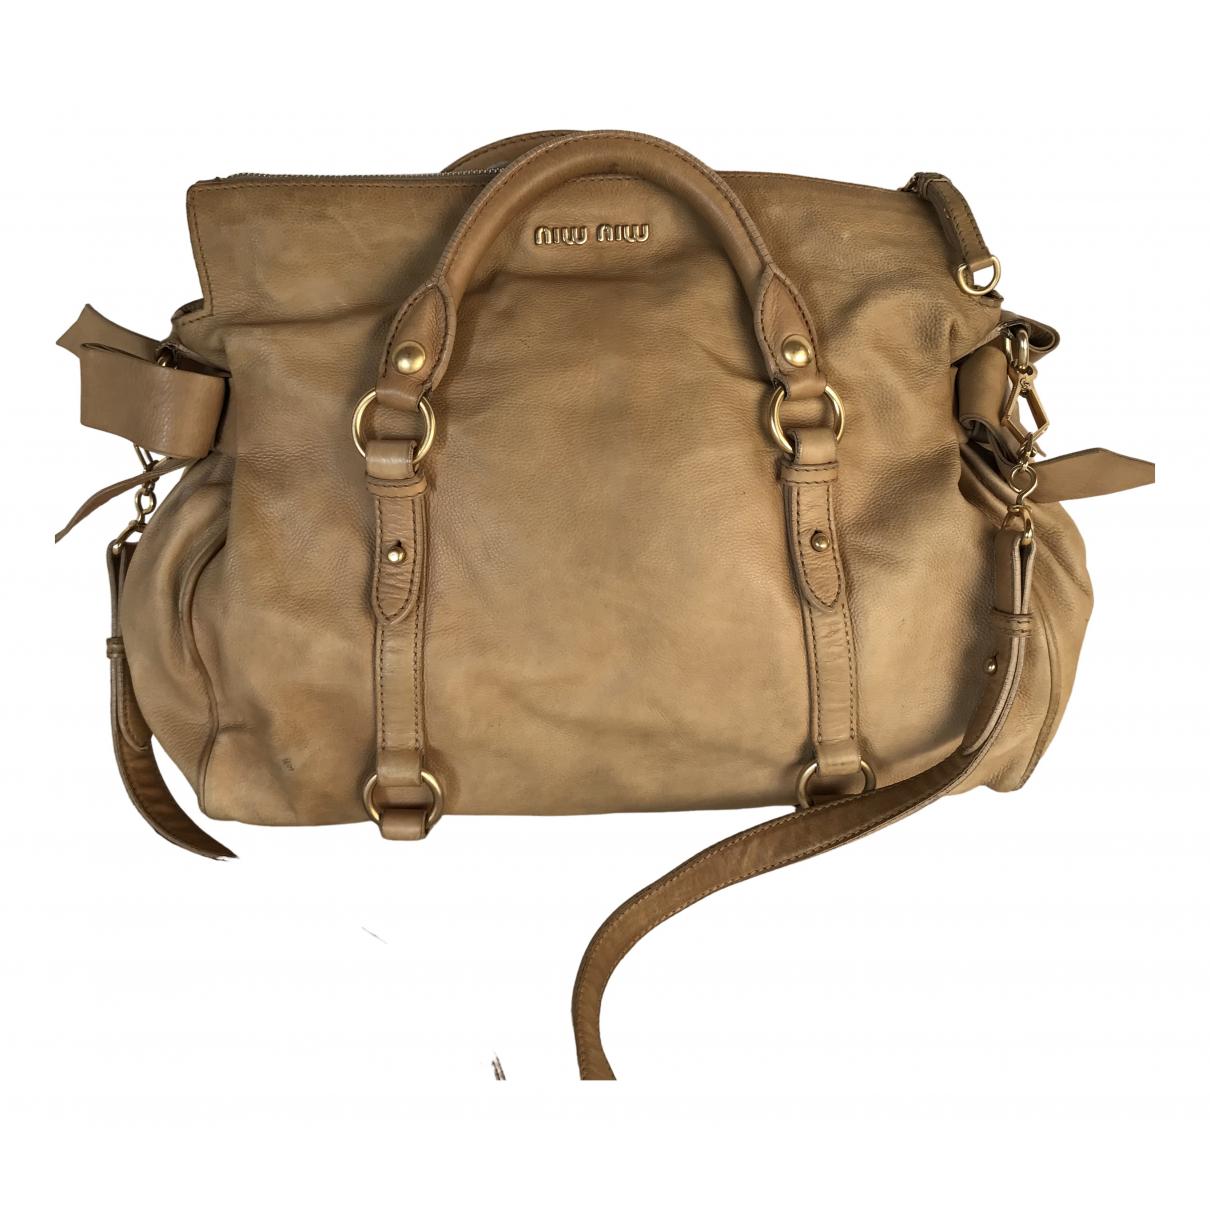 Miu Miu Bow bag Beige Leather handbag for Women \N